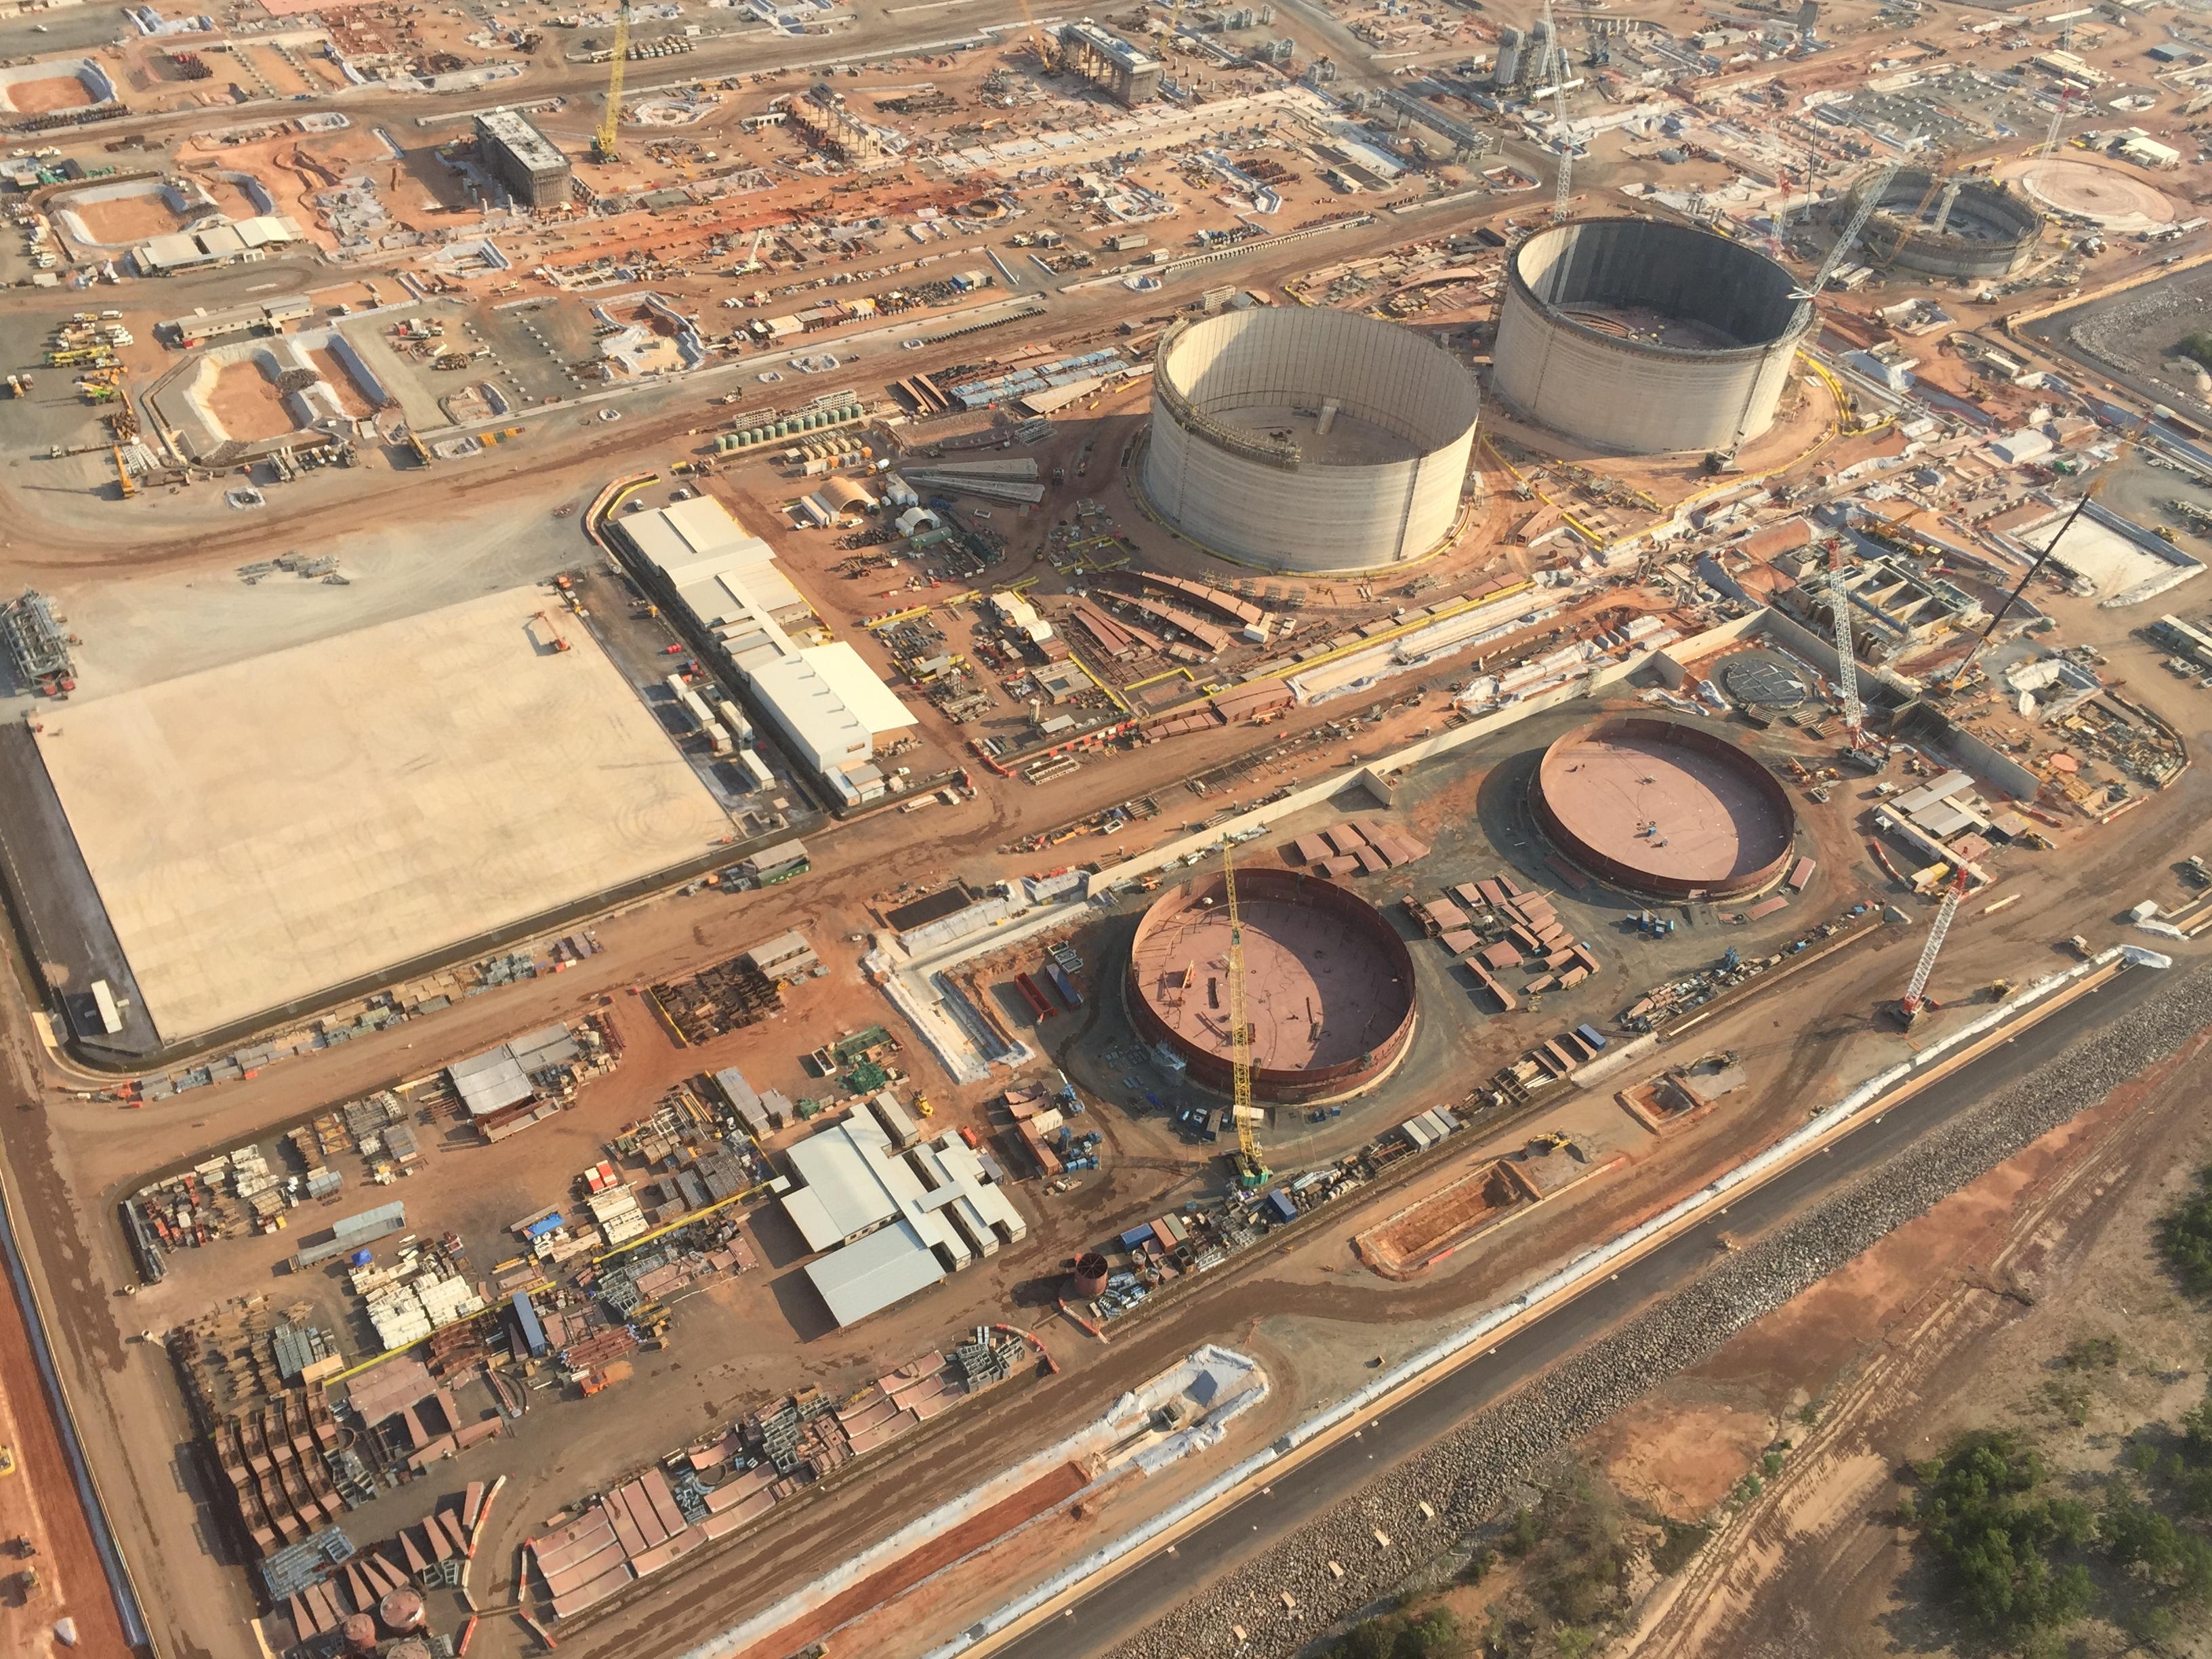 An LNG facility under construction.